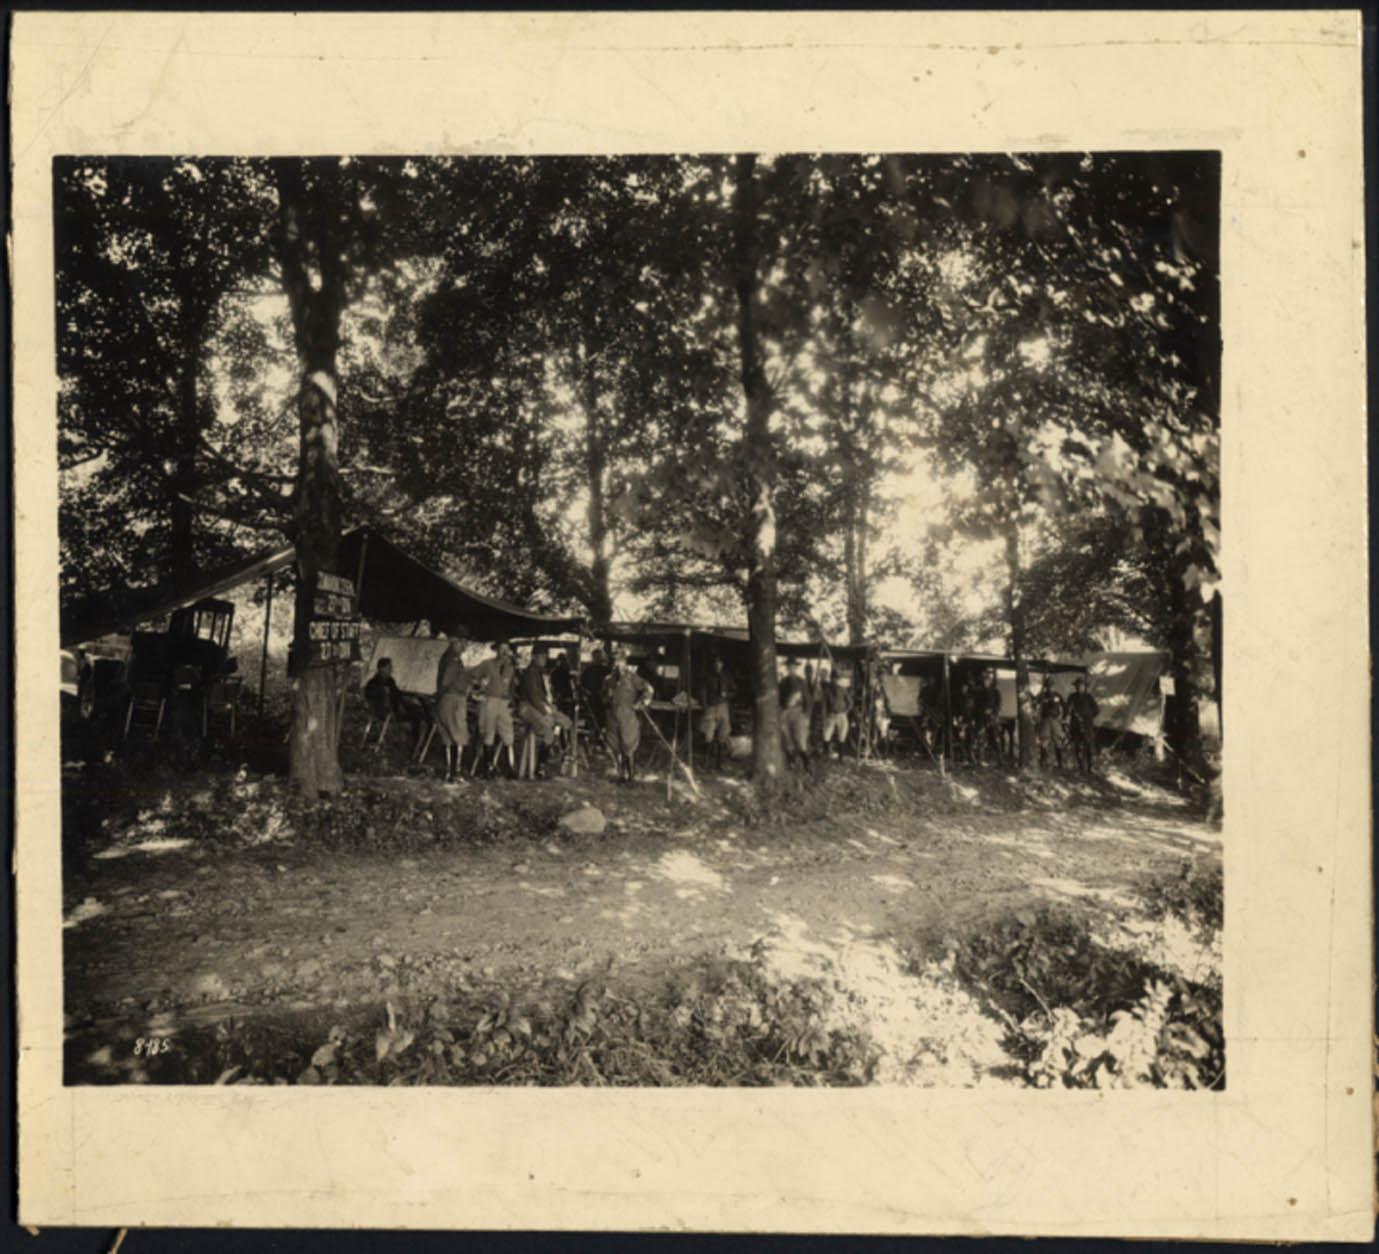 US Army New York 27th Division Commanding General John O Ryan HQ photo ca 1917